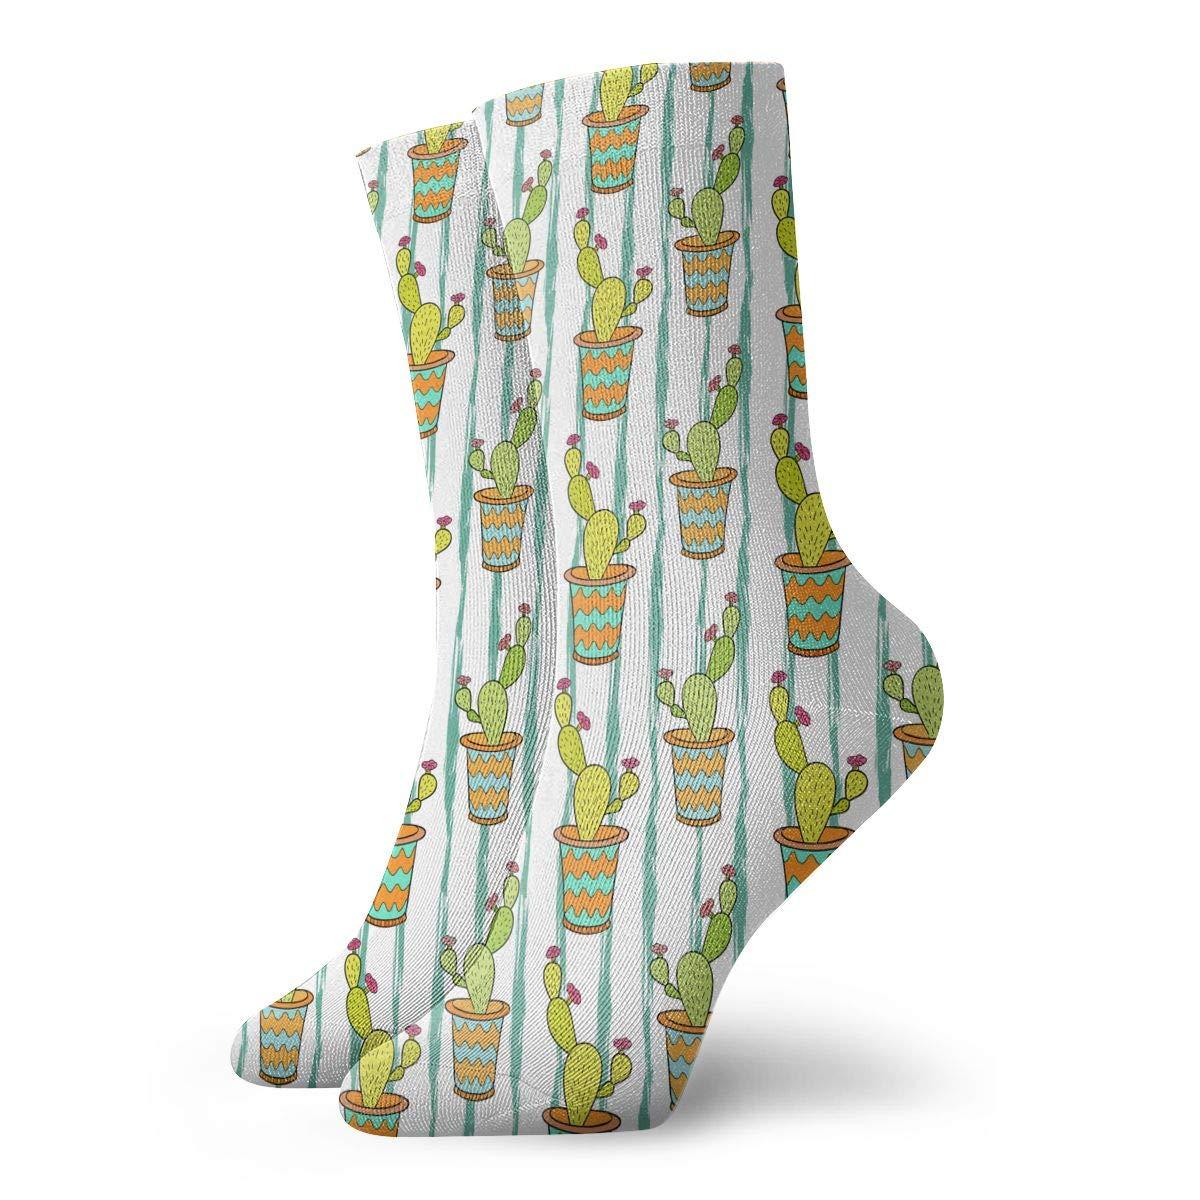 Unisex Cactus Colorful Cartoon Flowers Athletic Quarter Ankle Print Breathable Hiking Running Socks